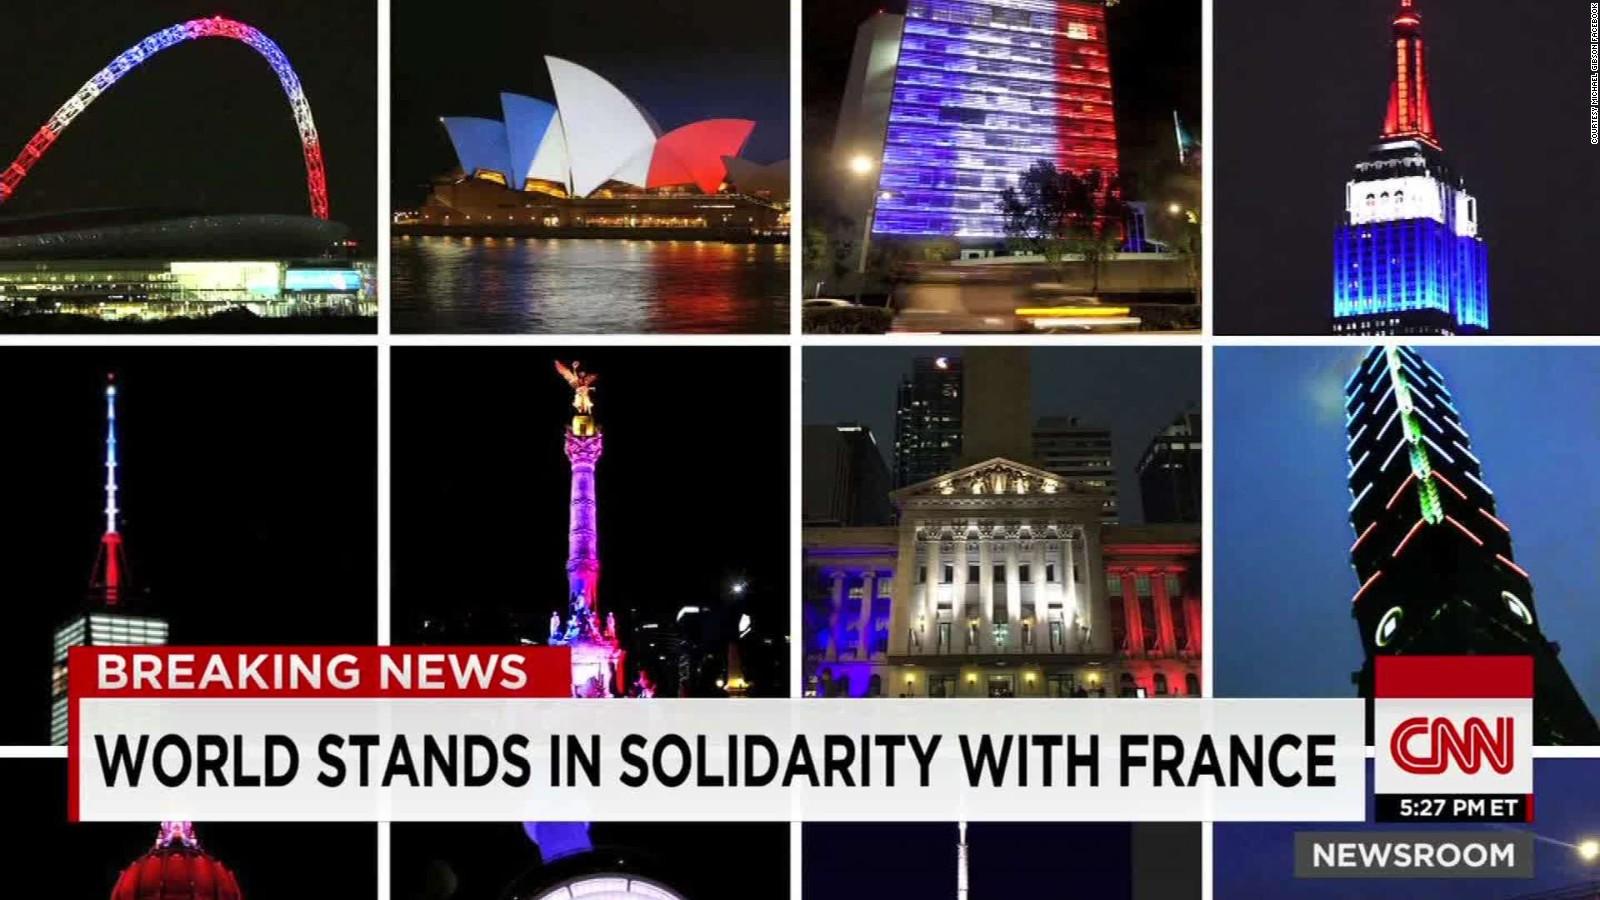 00-paris-attacks-world-leaders-react-dnt-magnay-nr-00000723-full-169